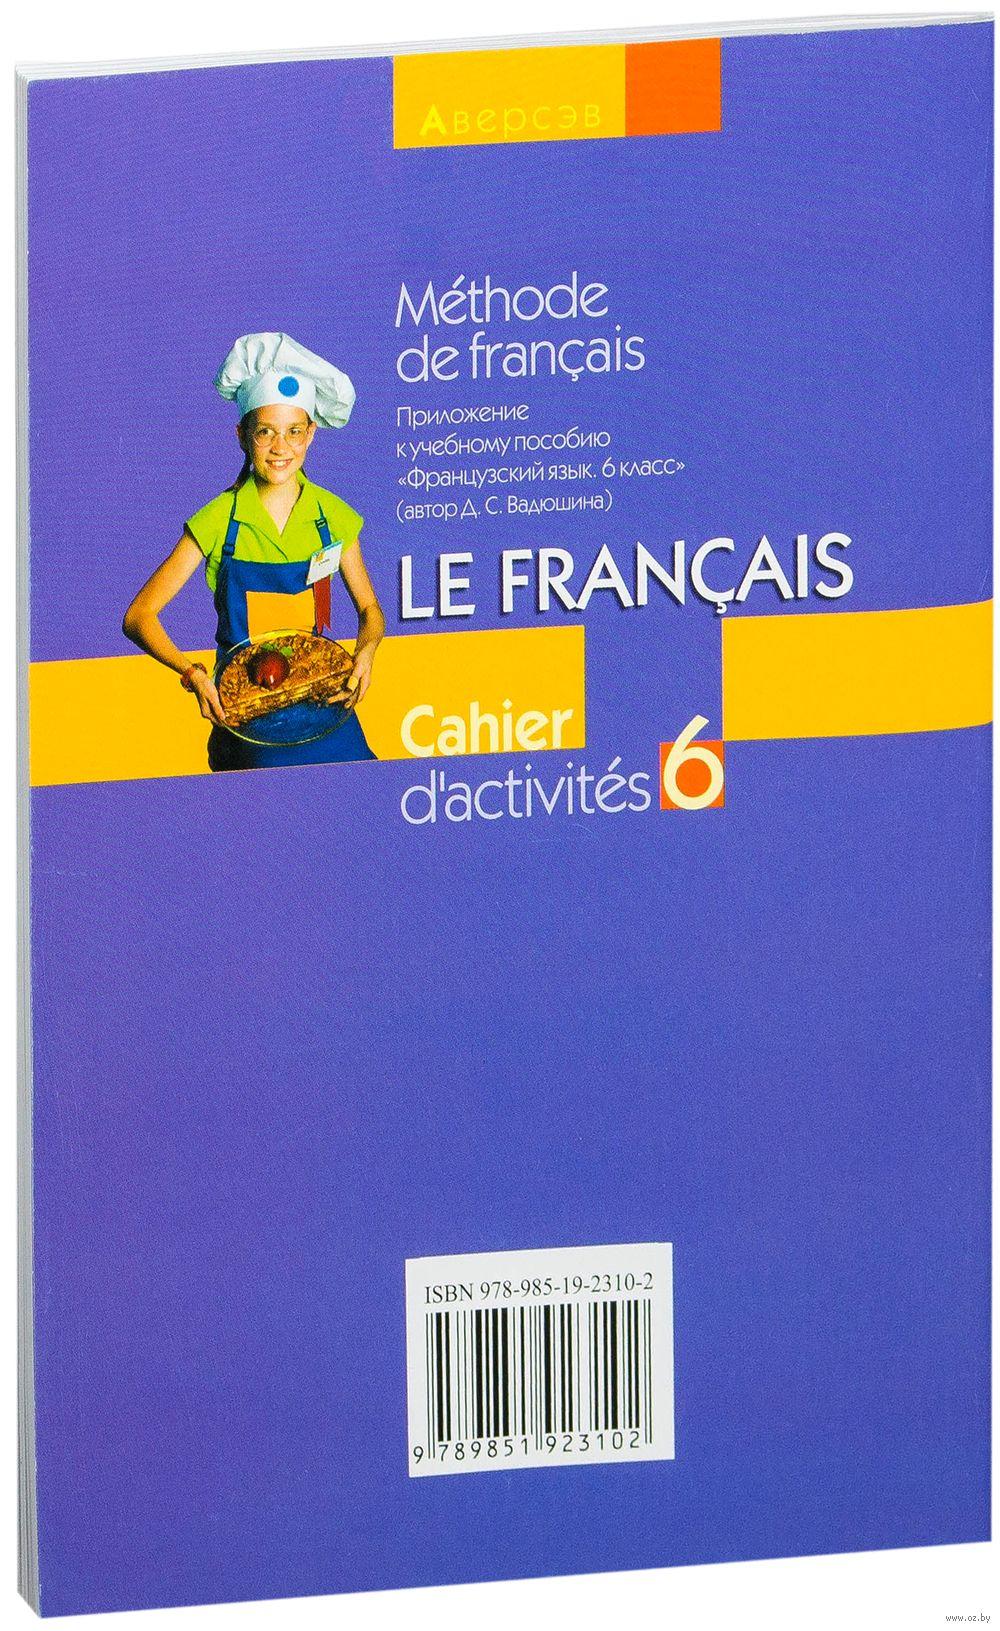 французский язык гдз вадюшина 9 класс